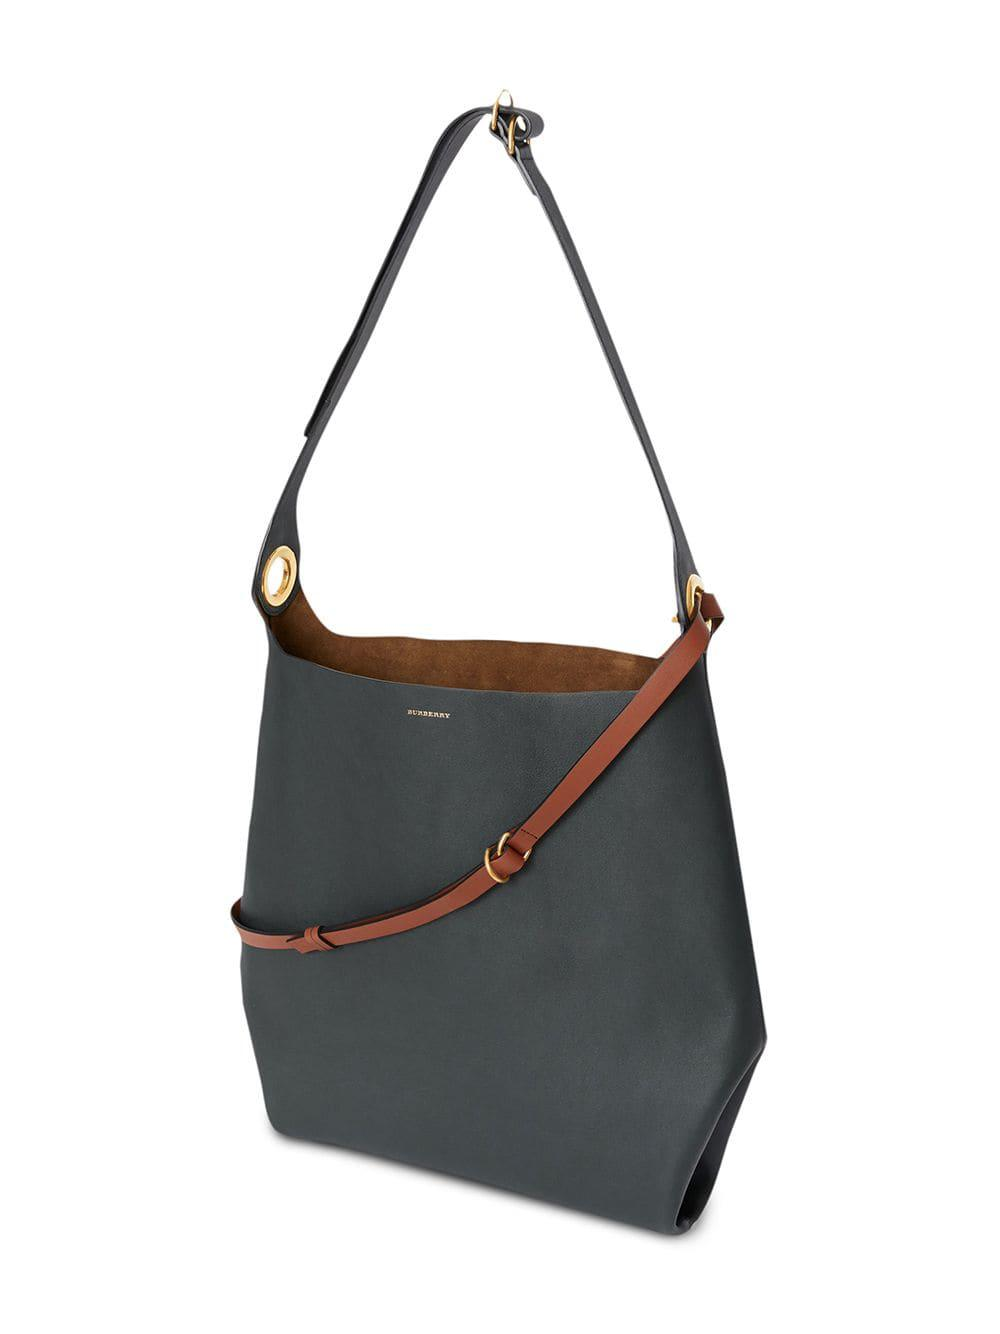 Burberry - Blue The Leather Grommet Detail Bag - Lyst. View fullscreen 8e24ce0ef6c87